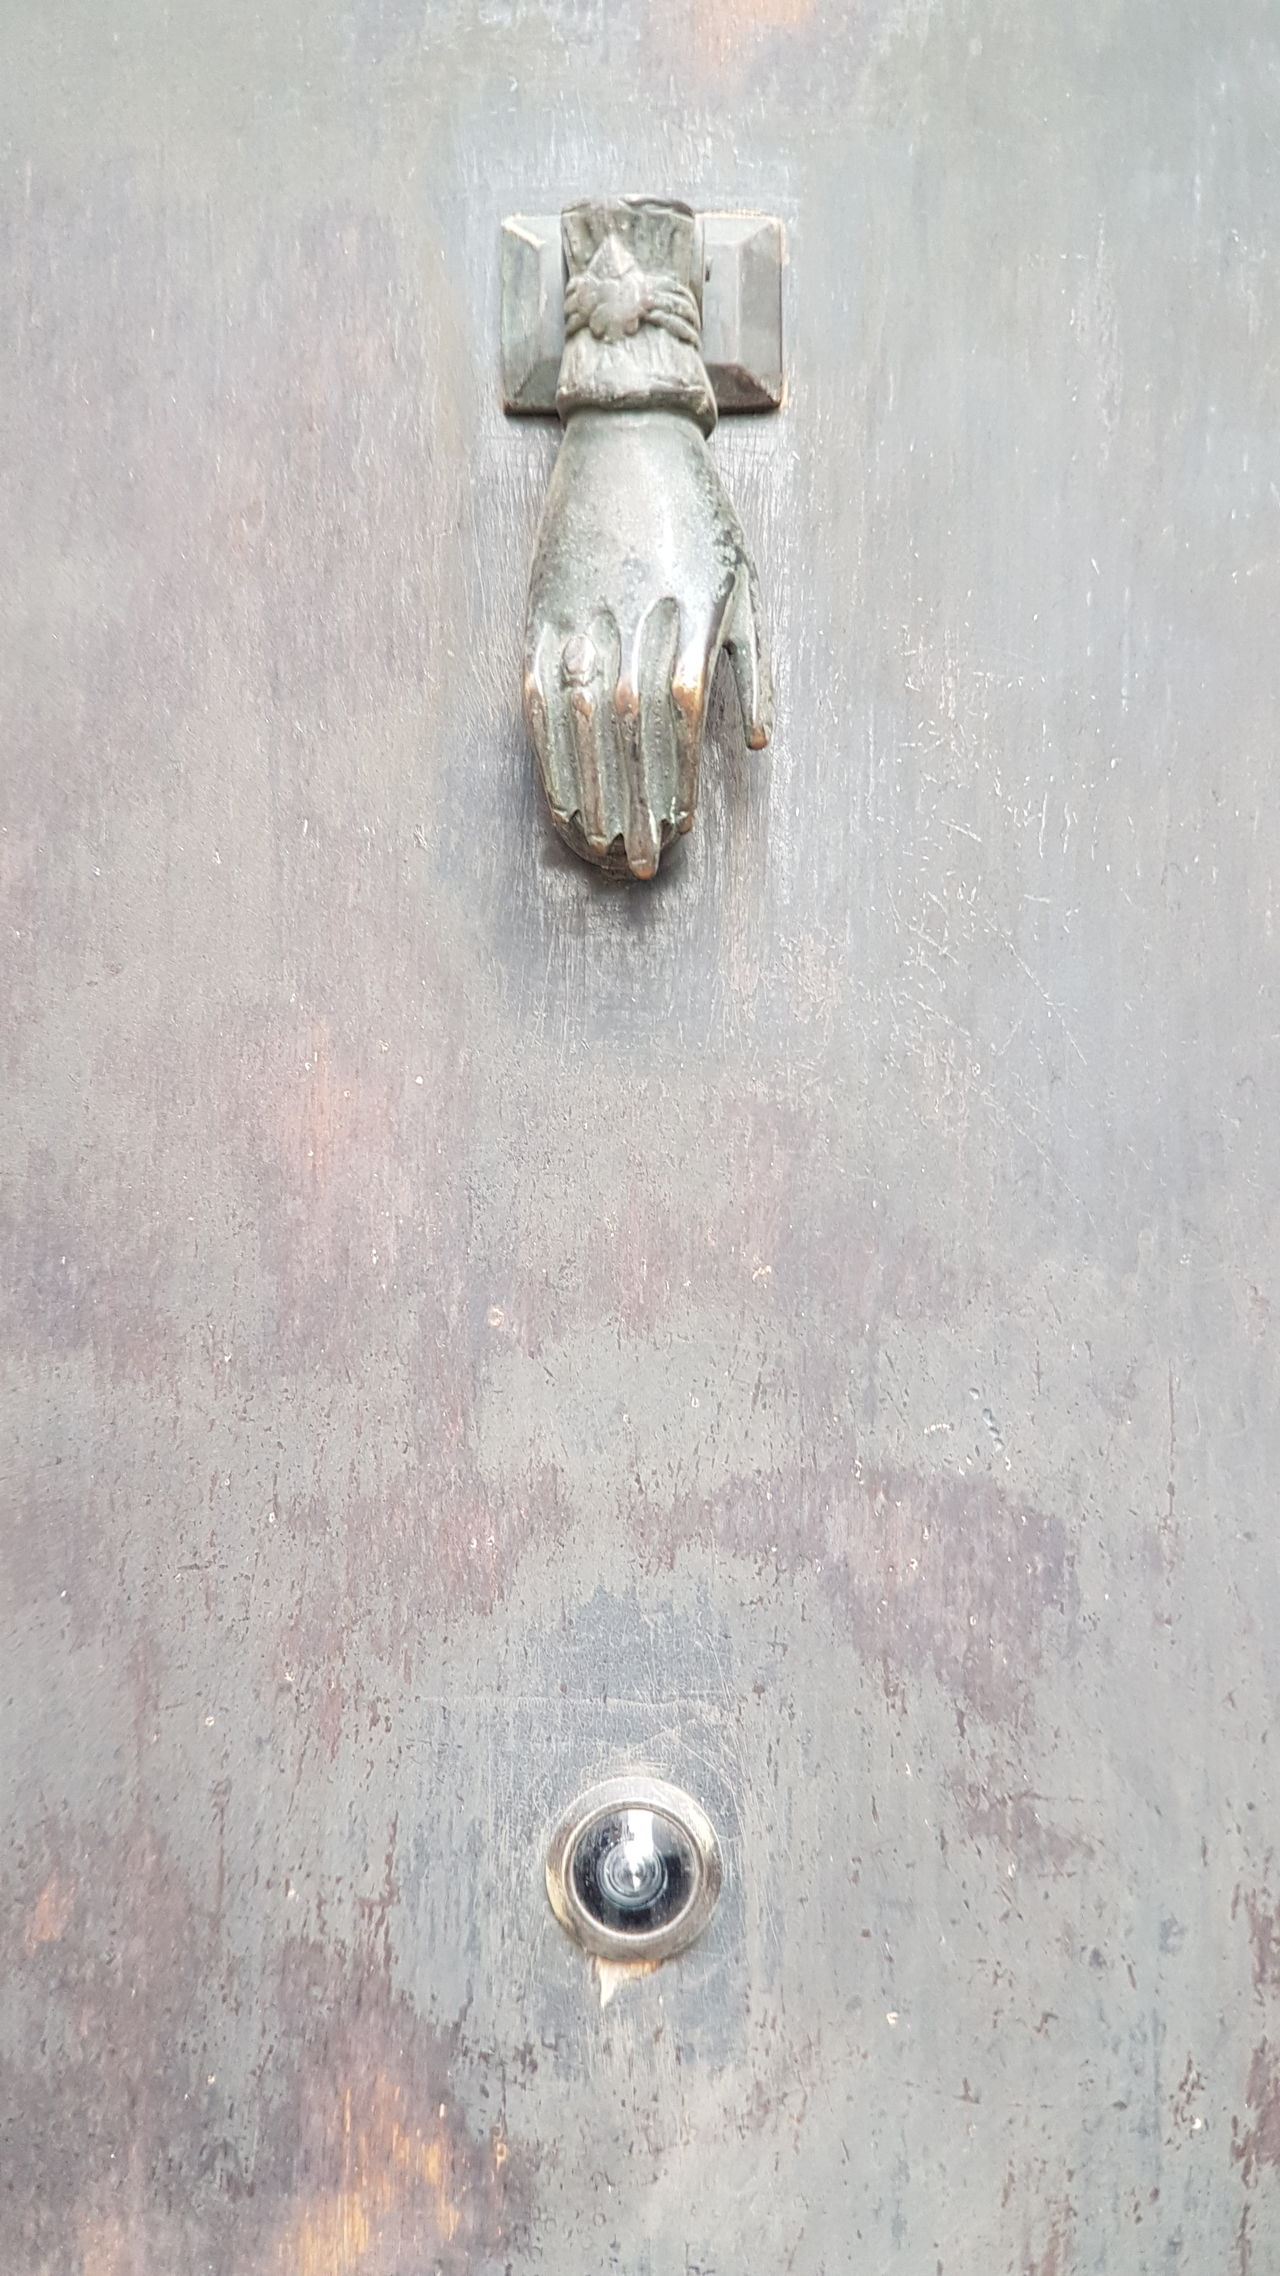 Metal Surface Background Pattern Surfaces And Textures Structure Communication Door Doorporn Hand Look Spion Spy Spook Intelligence Doors Metal Structure